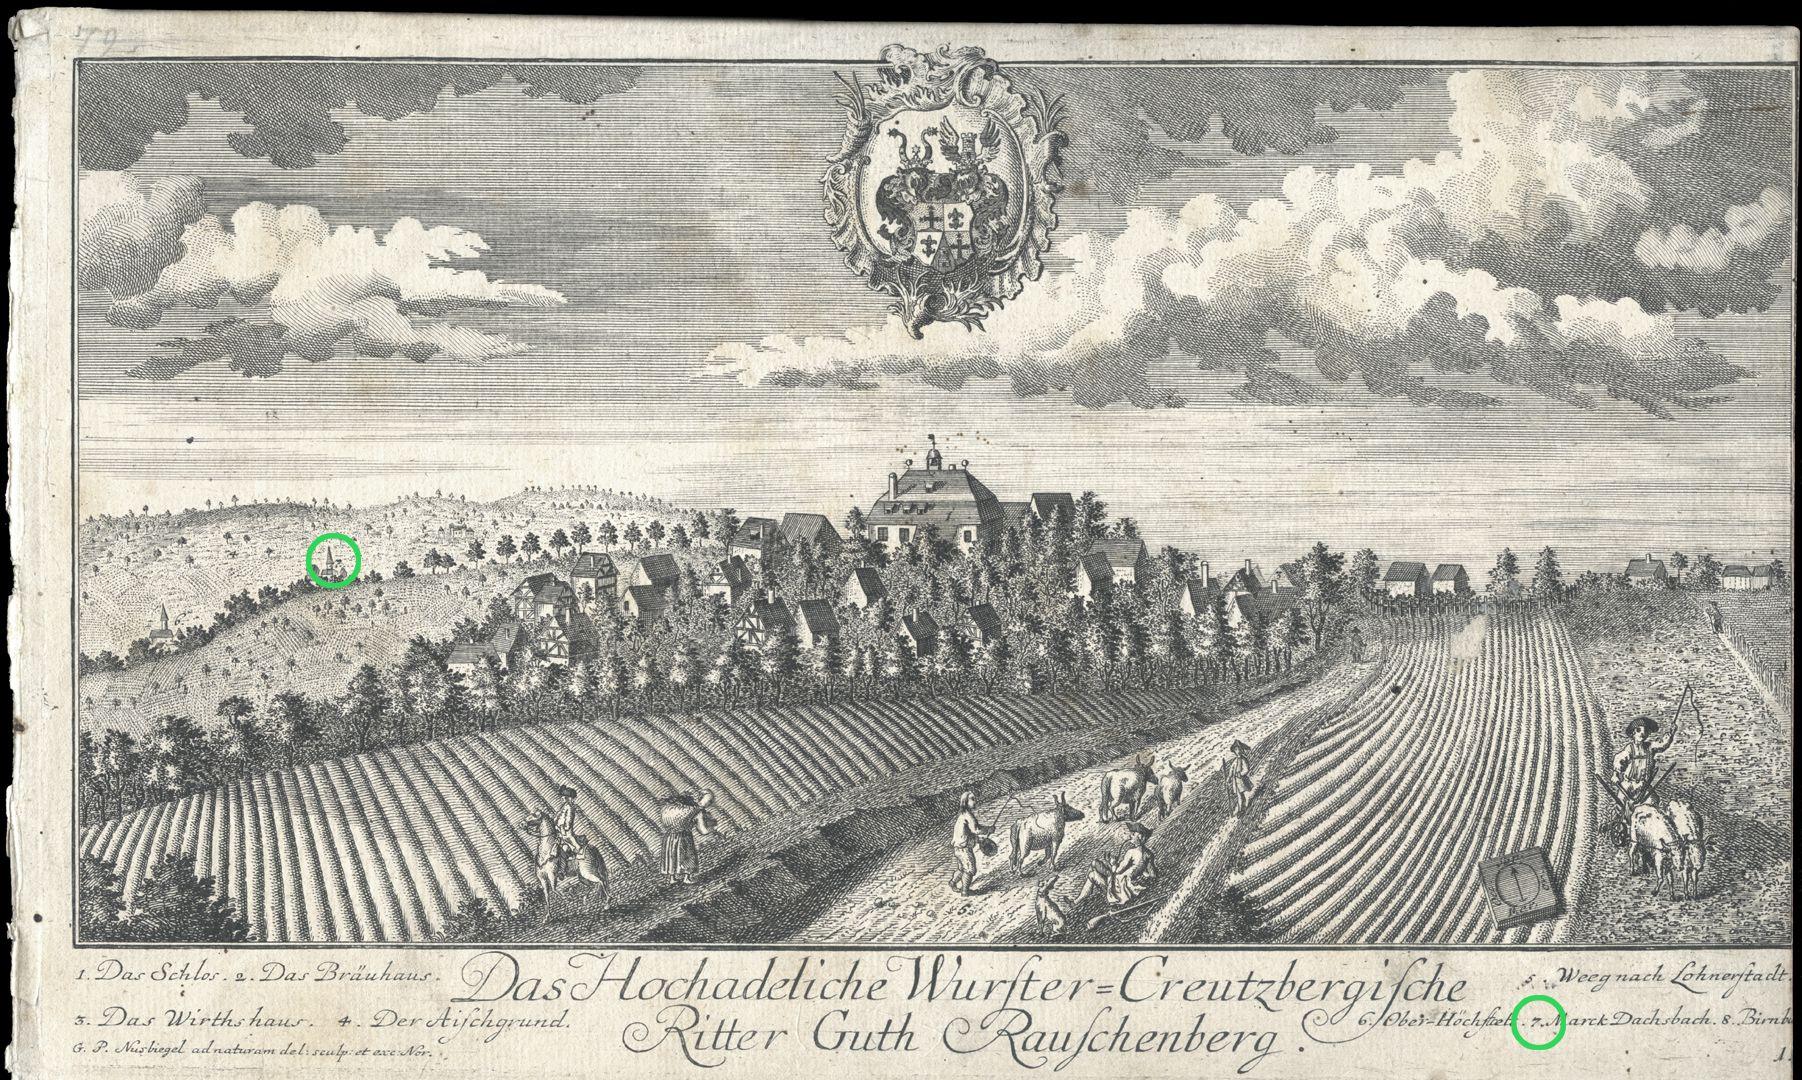 High-nobility-manor Rauschenberg of Wurster-Creutzberg Area Dachsbac